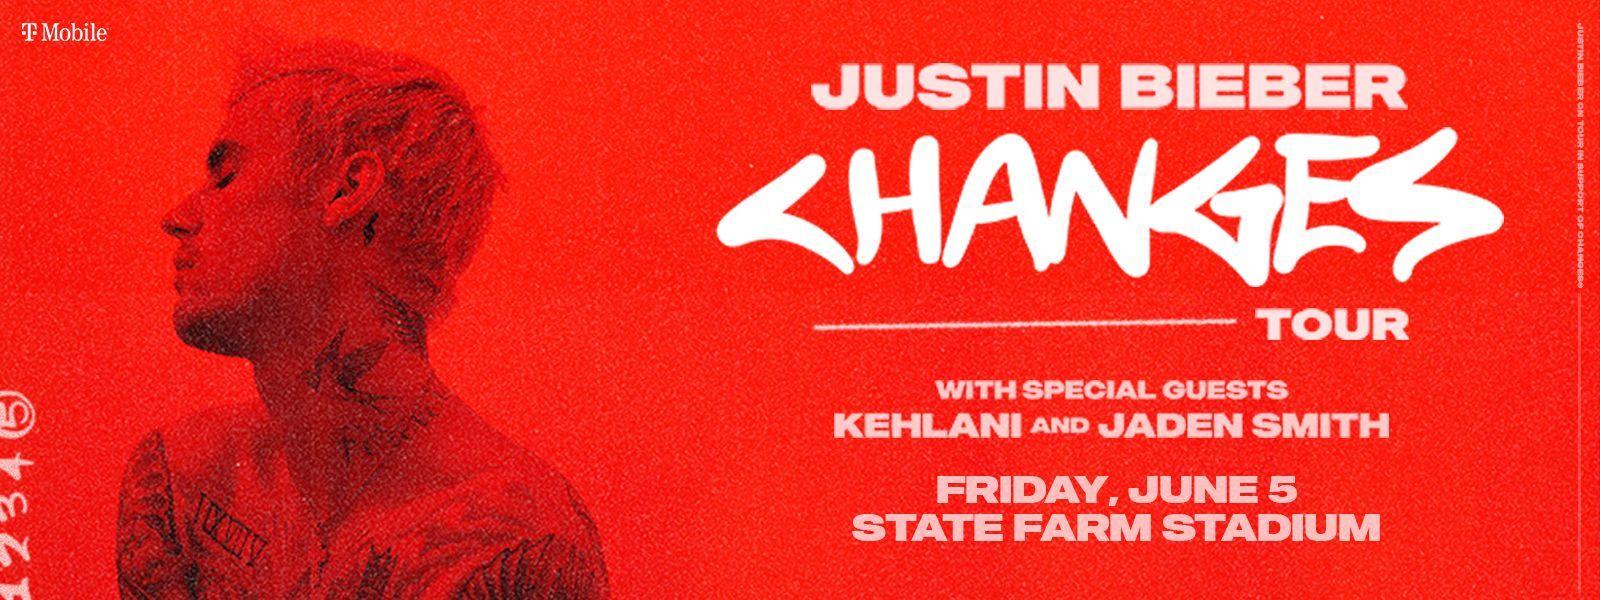 Justin Bieber Changes Tour